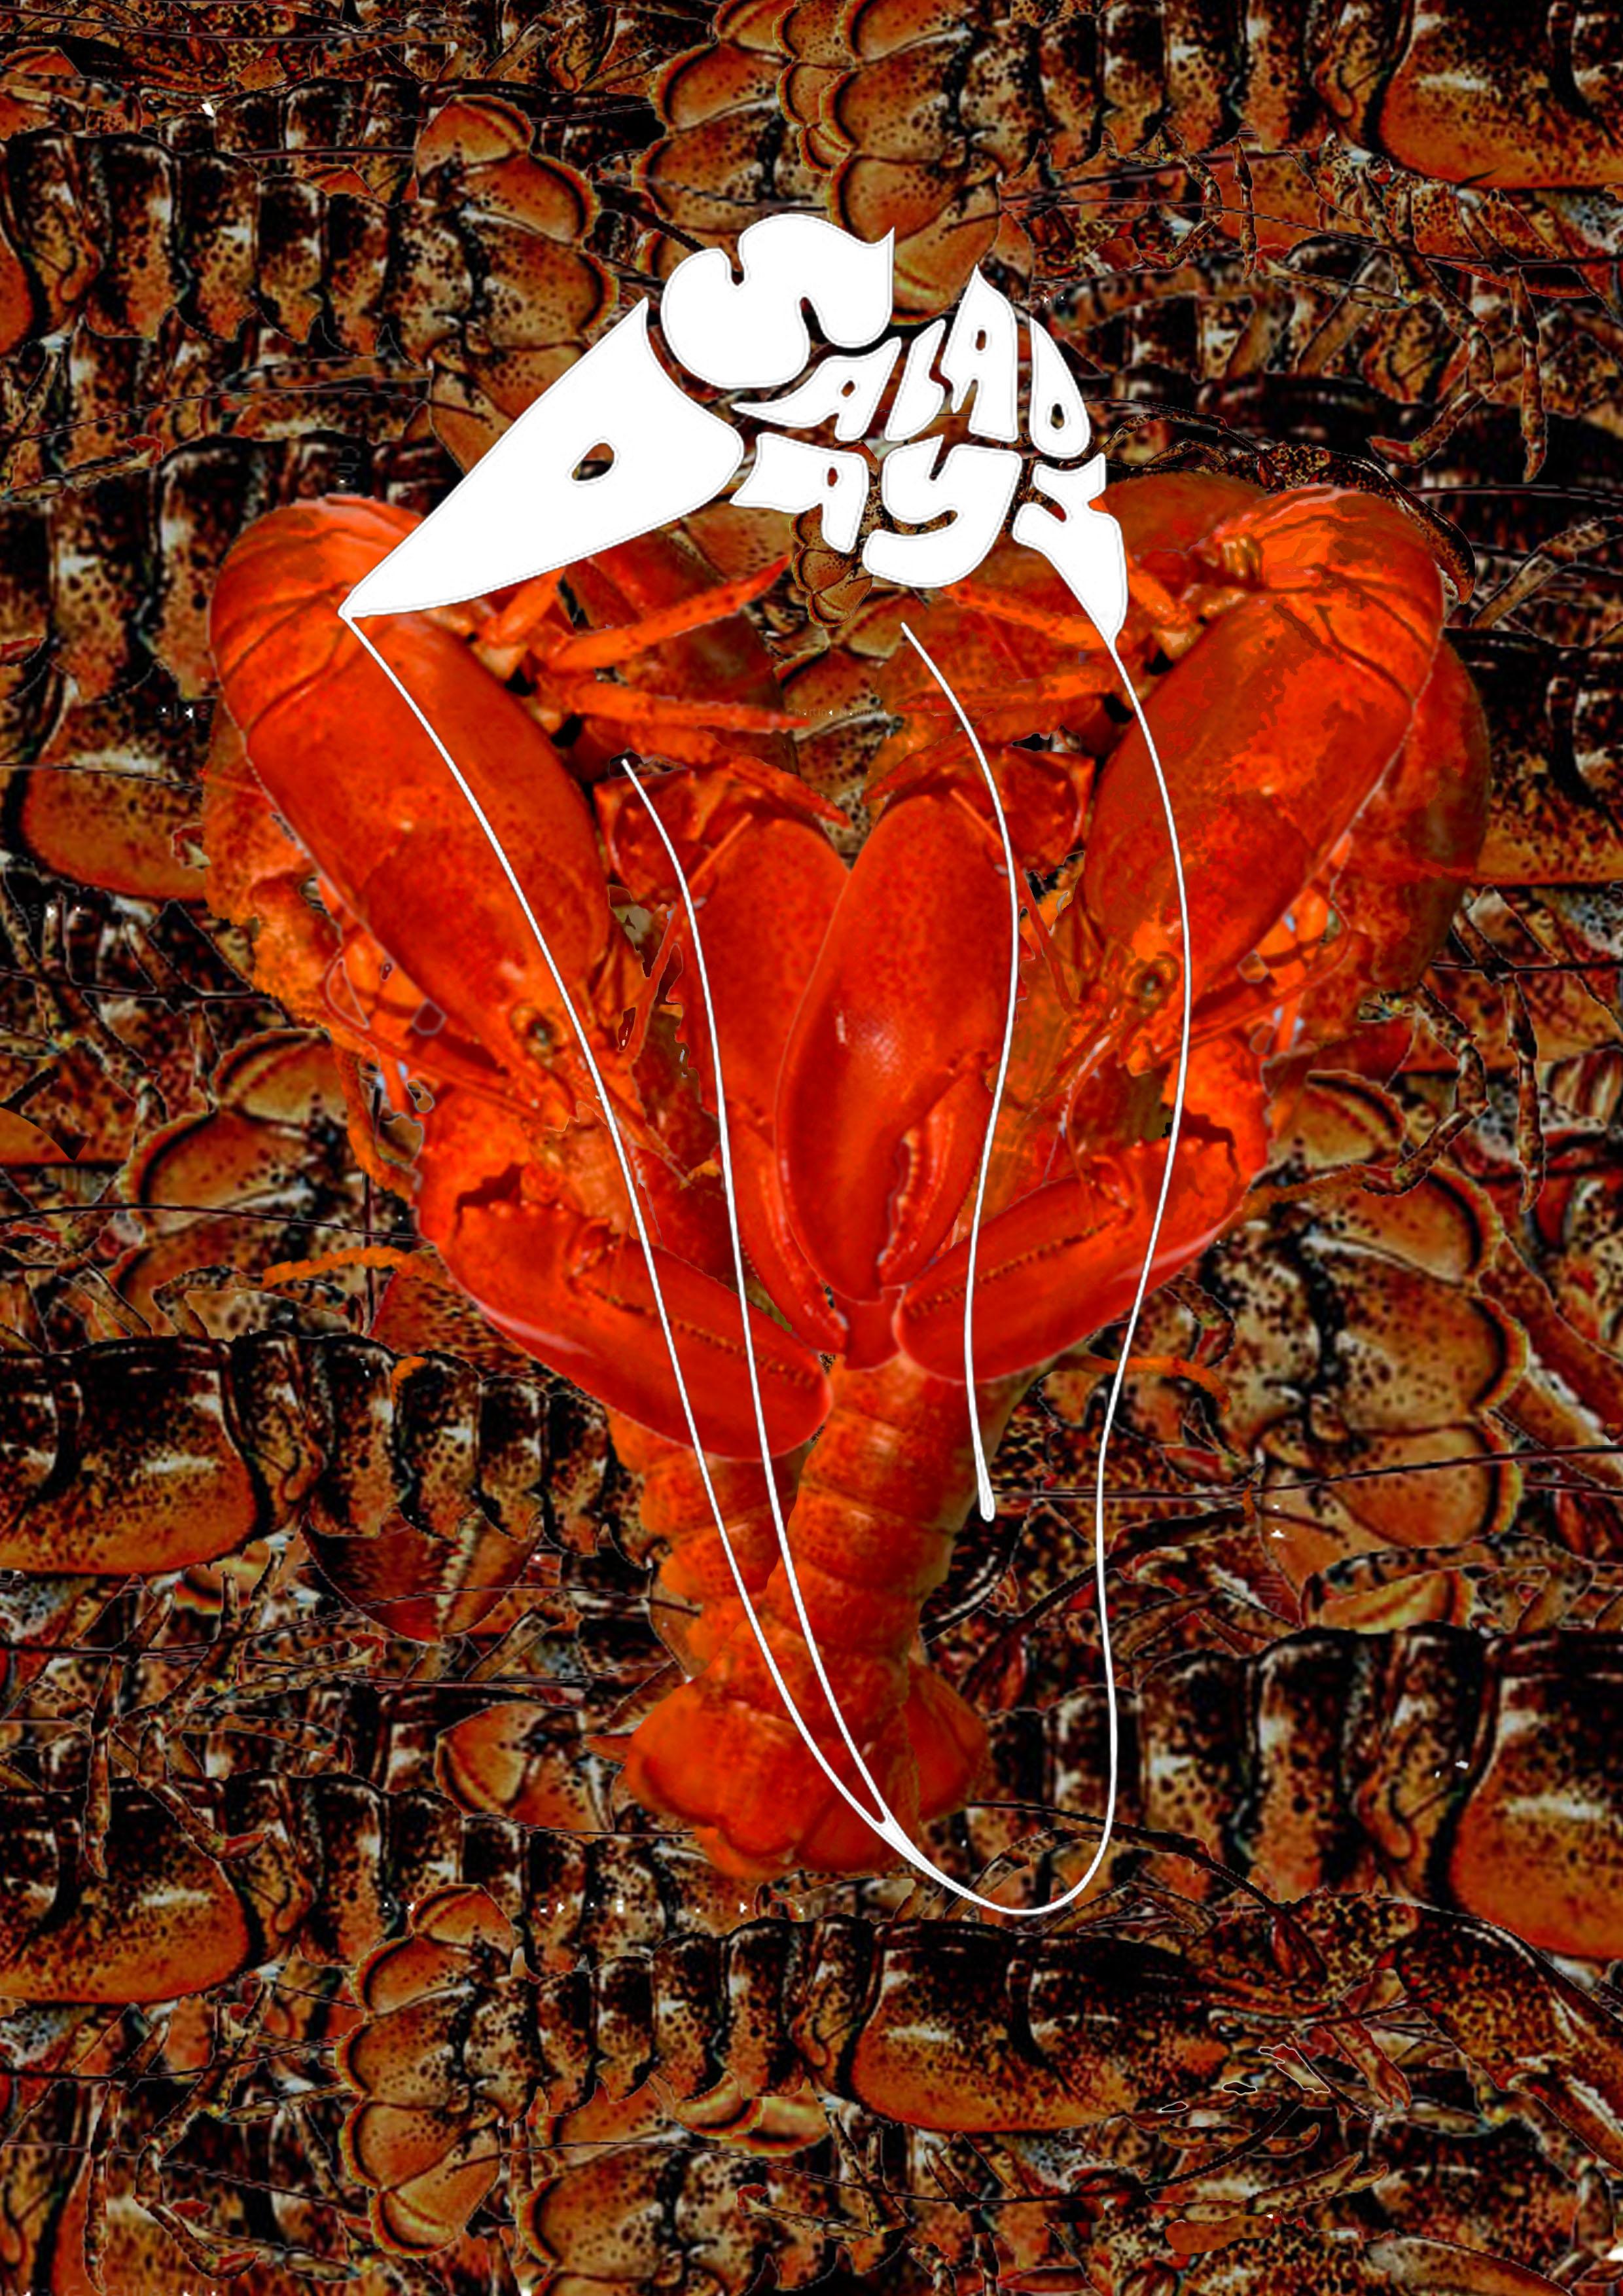 lobsterlove.jpg